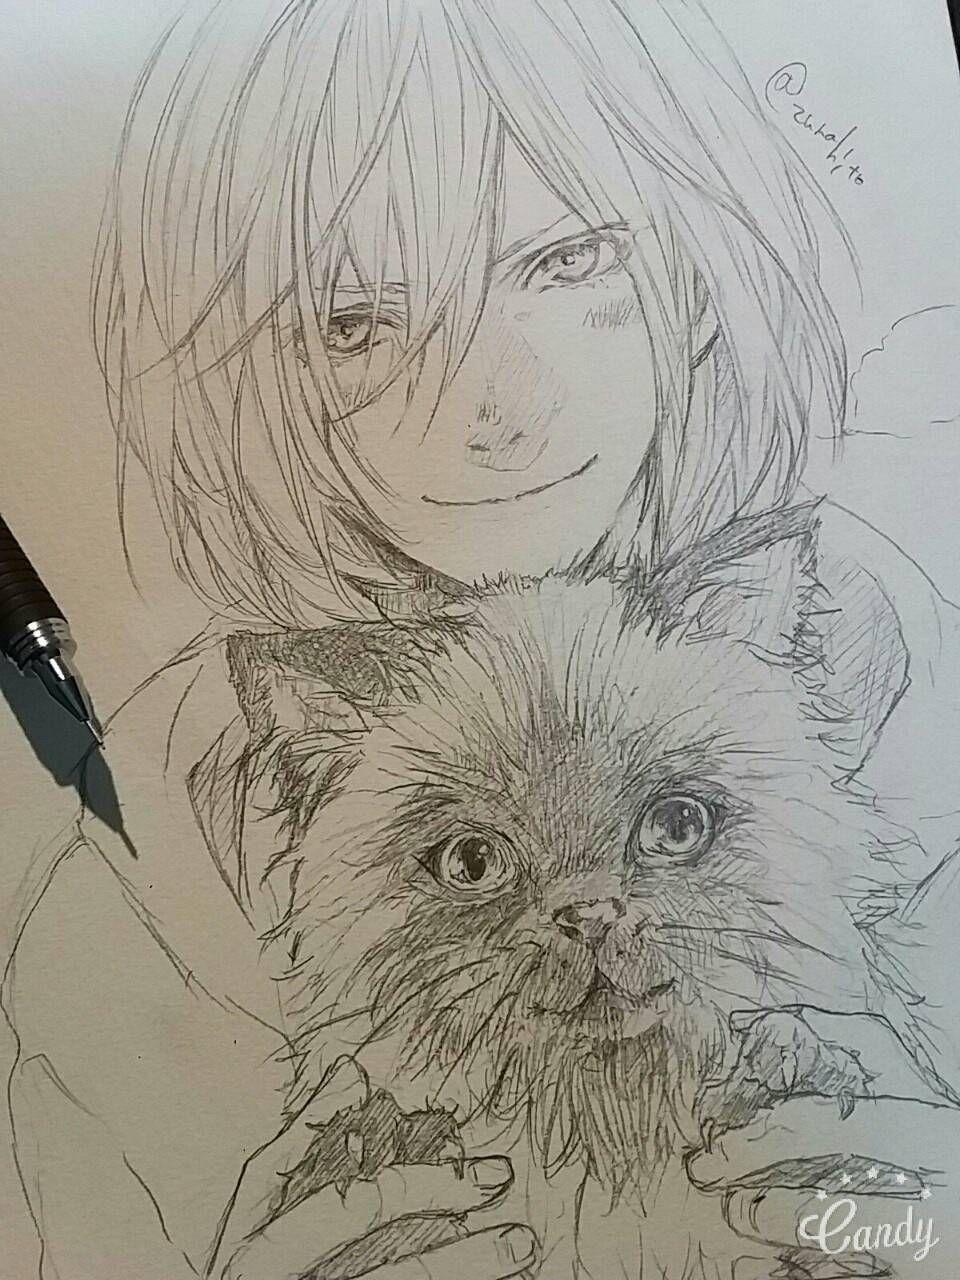 Idea by Dianna Z on Handdraw Line Draft Anime sketch